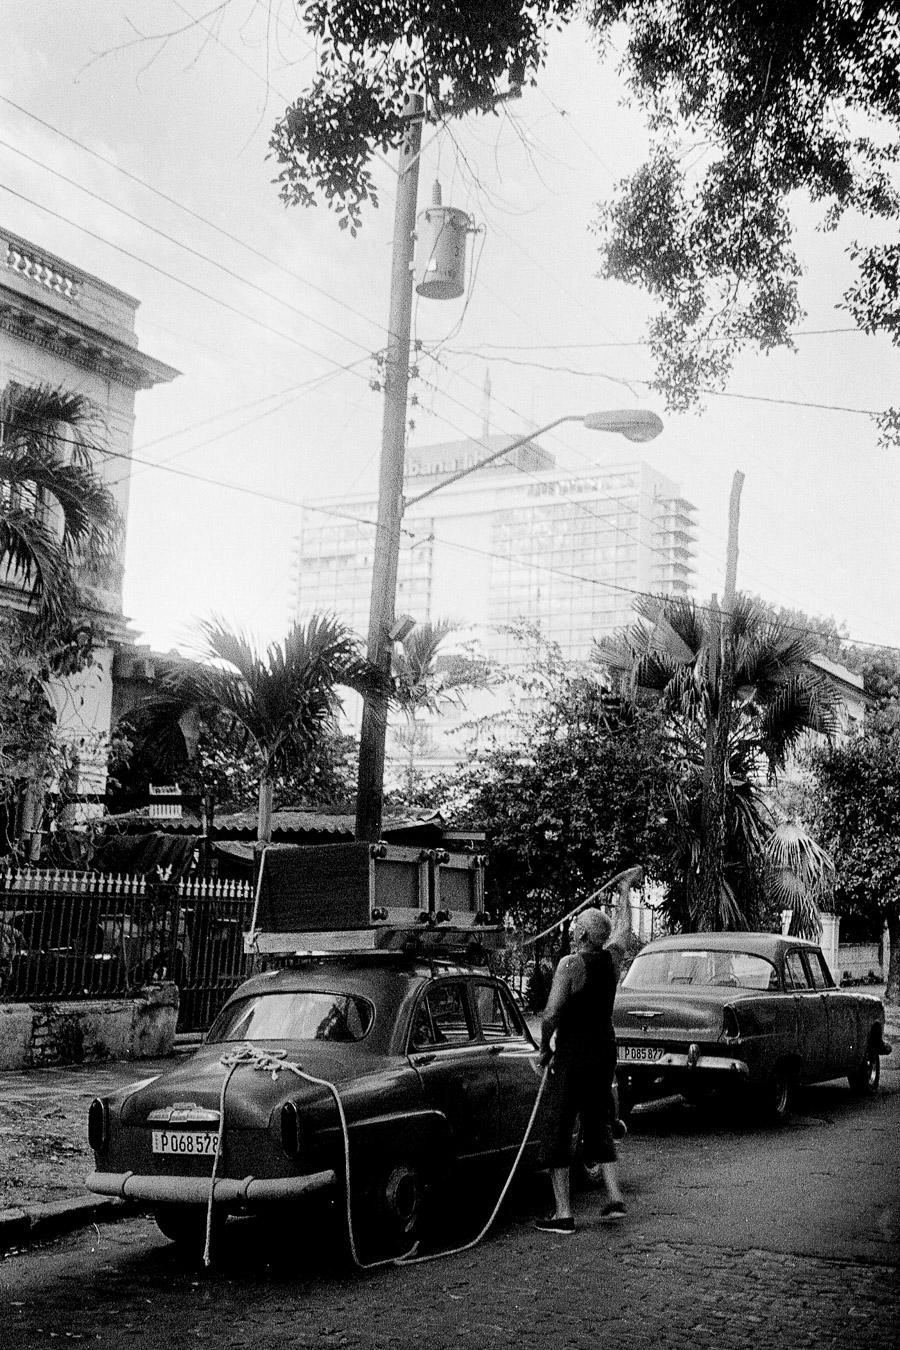 Kuba , Oktober 2016 - Havanna_Antje_Kroeger_362